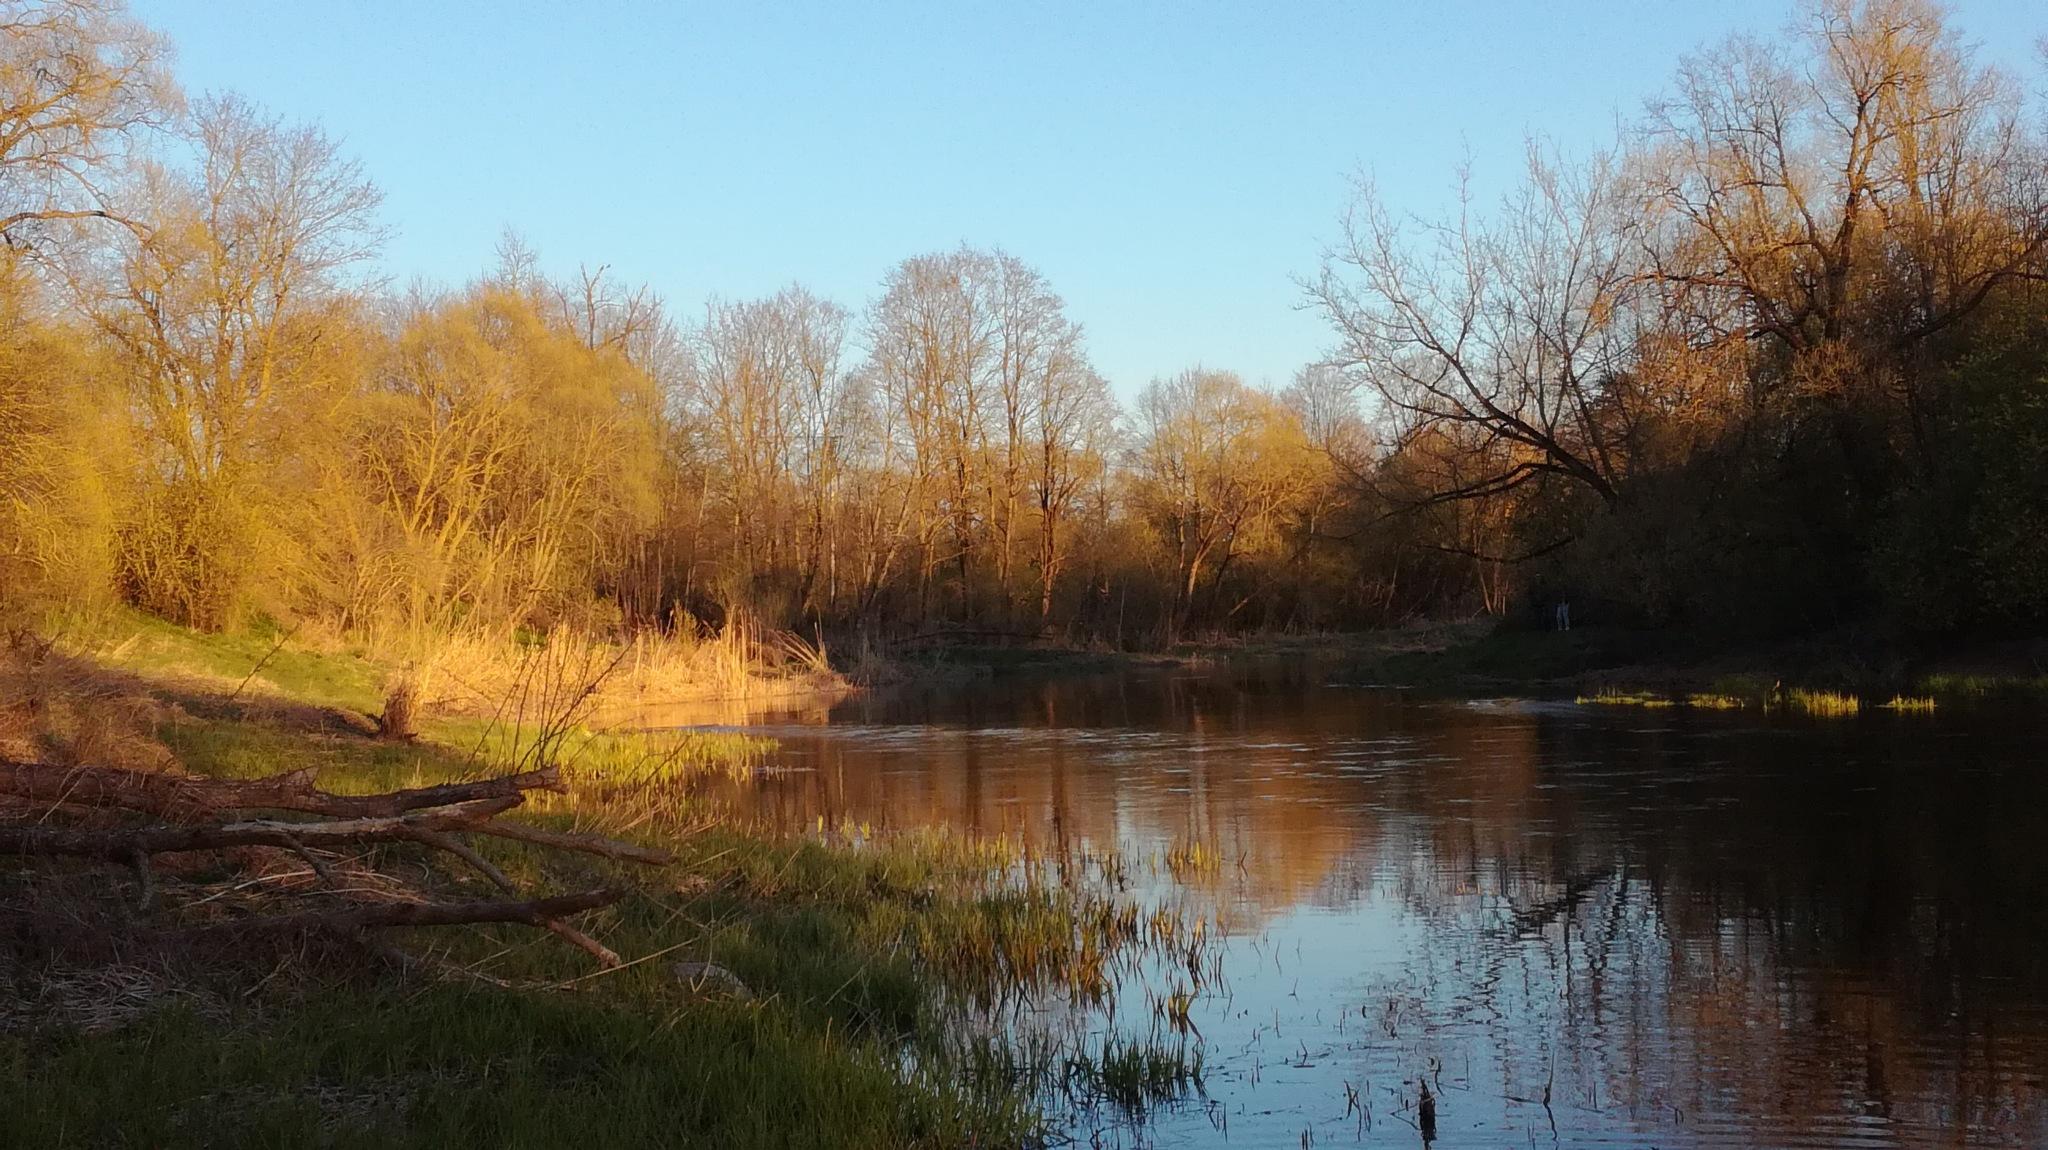 River in the spring evening by uzkuraitiene62